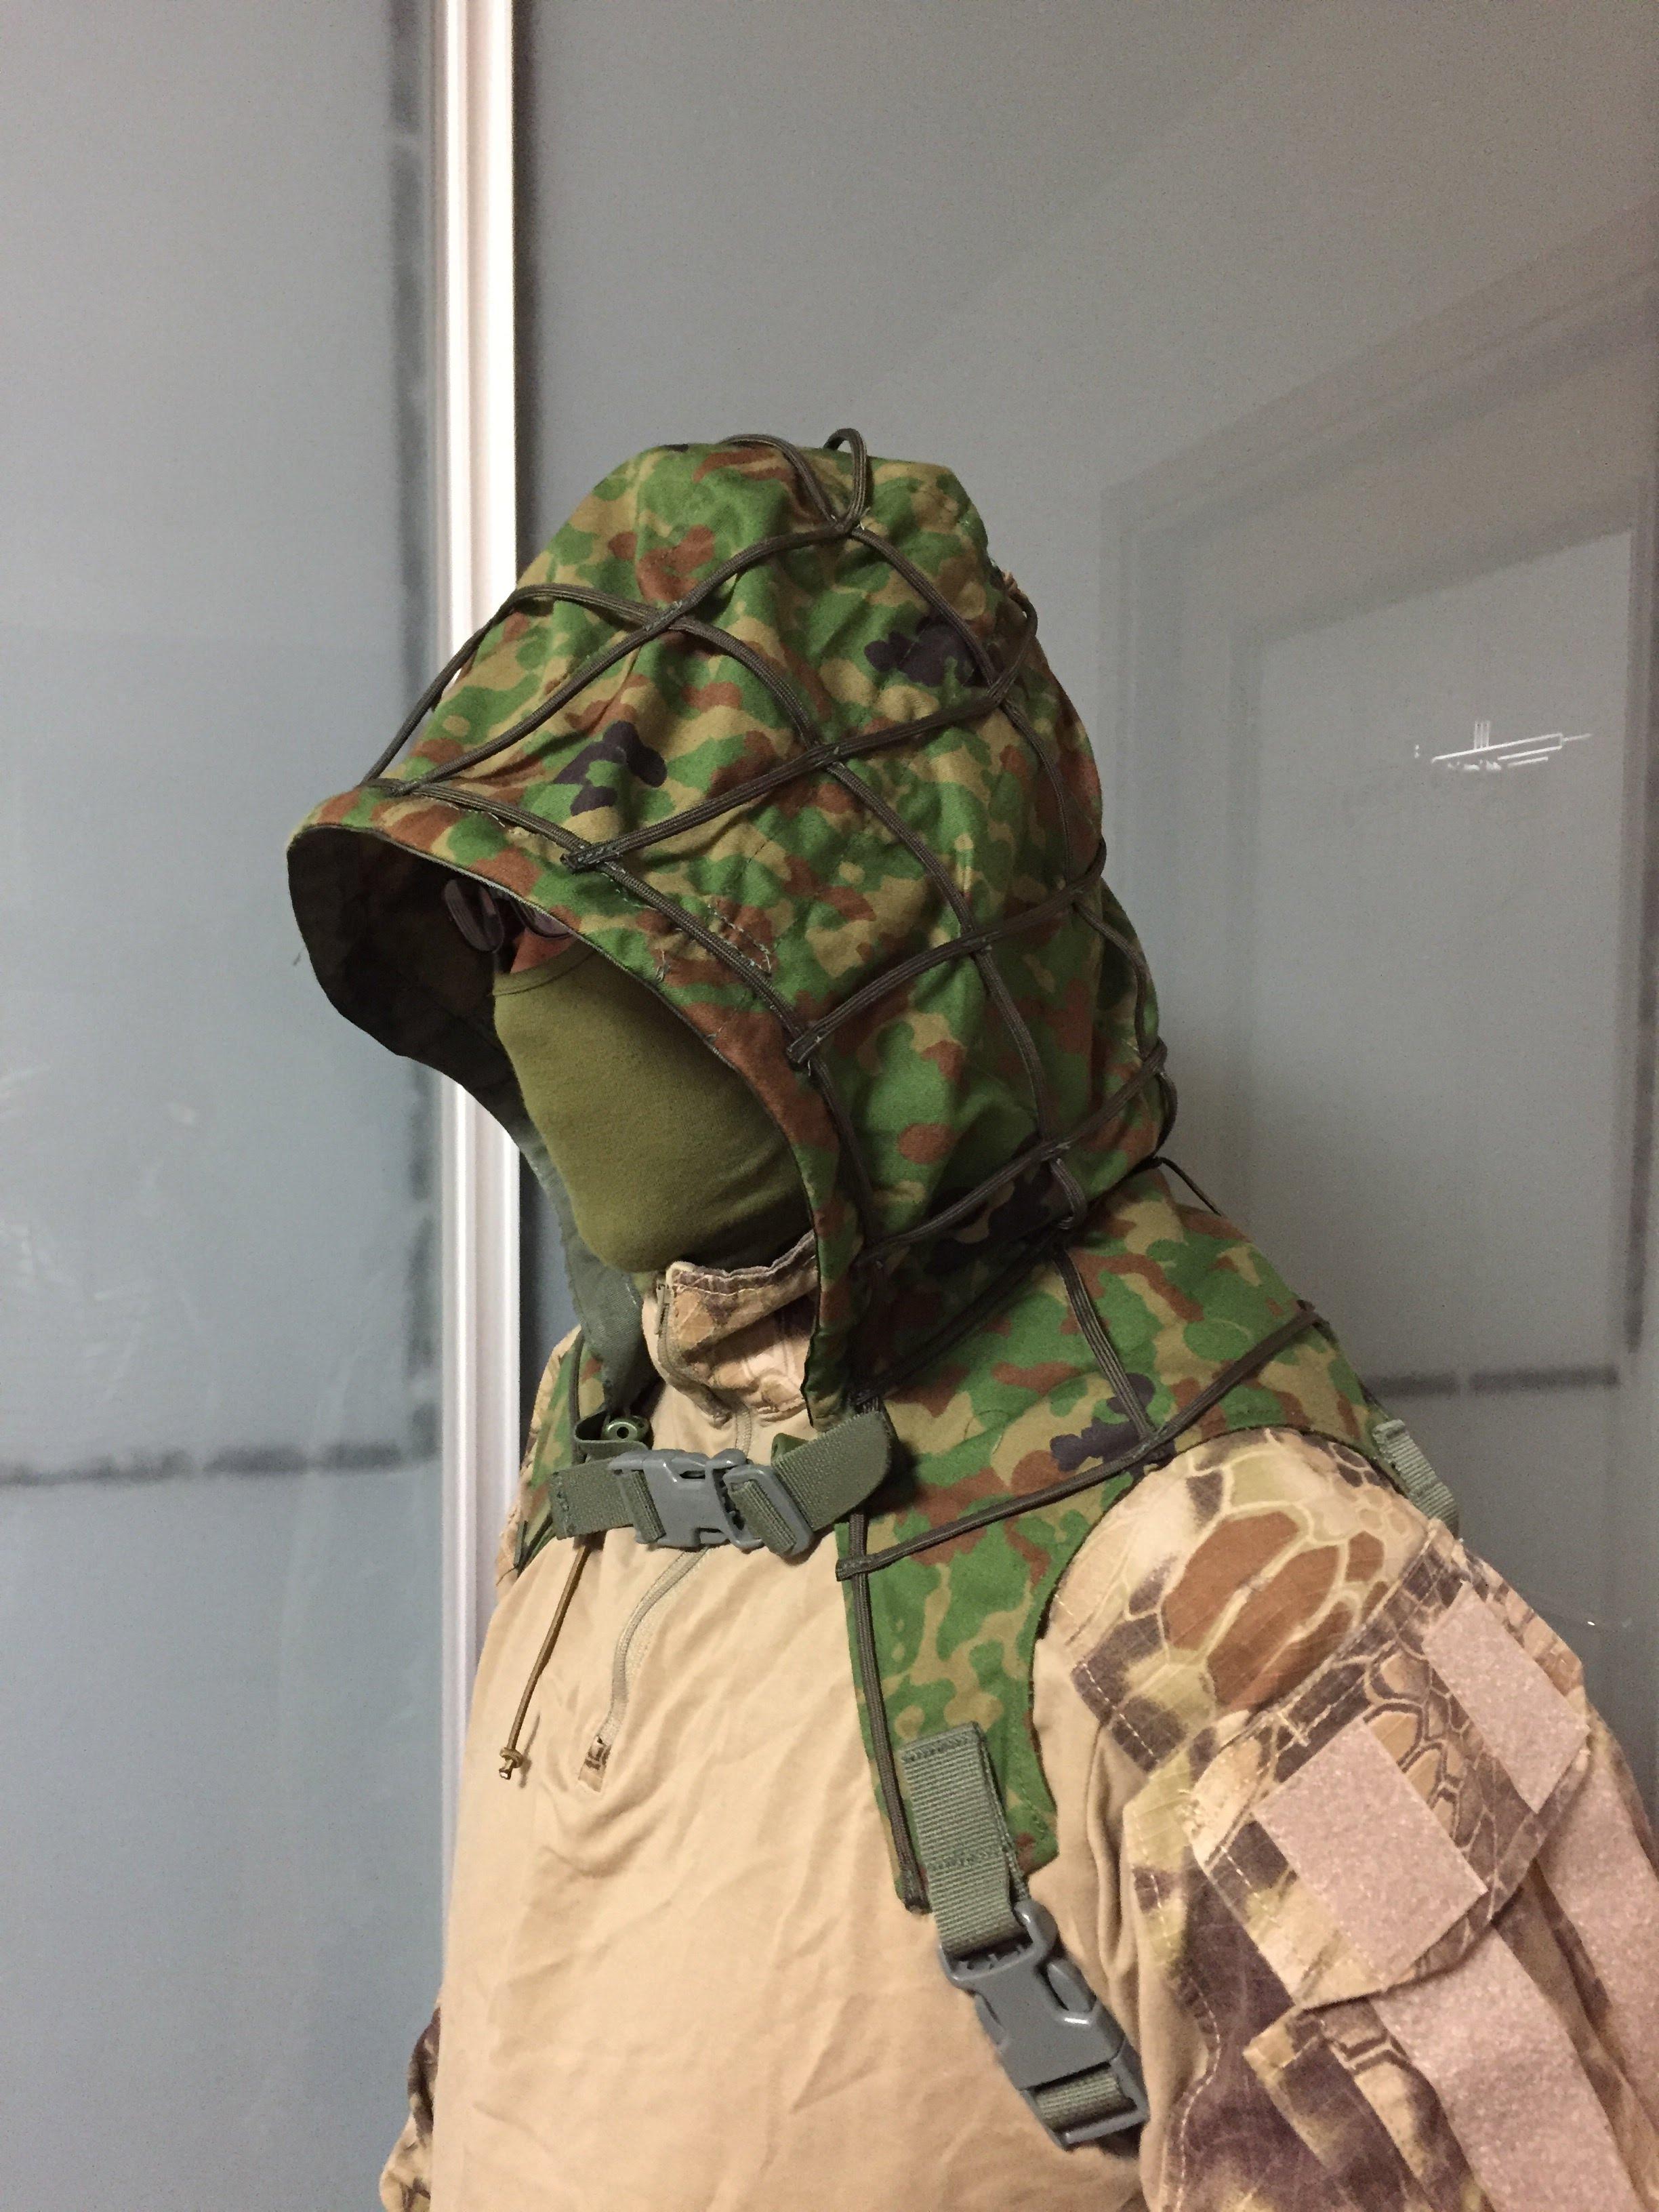 Sukerucom南蛮堂コラボ商品 SDF Tactical Alone Hood タクティカルアローンフード パラコード版 限定色陸自迷彩